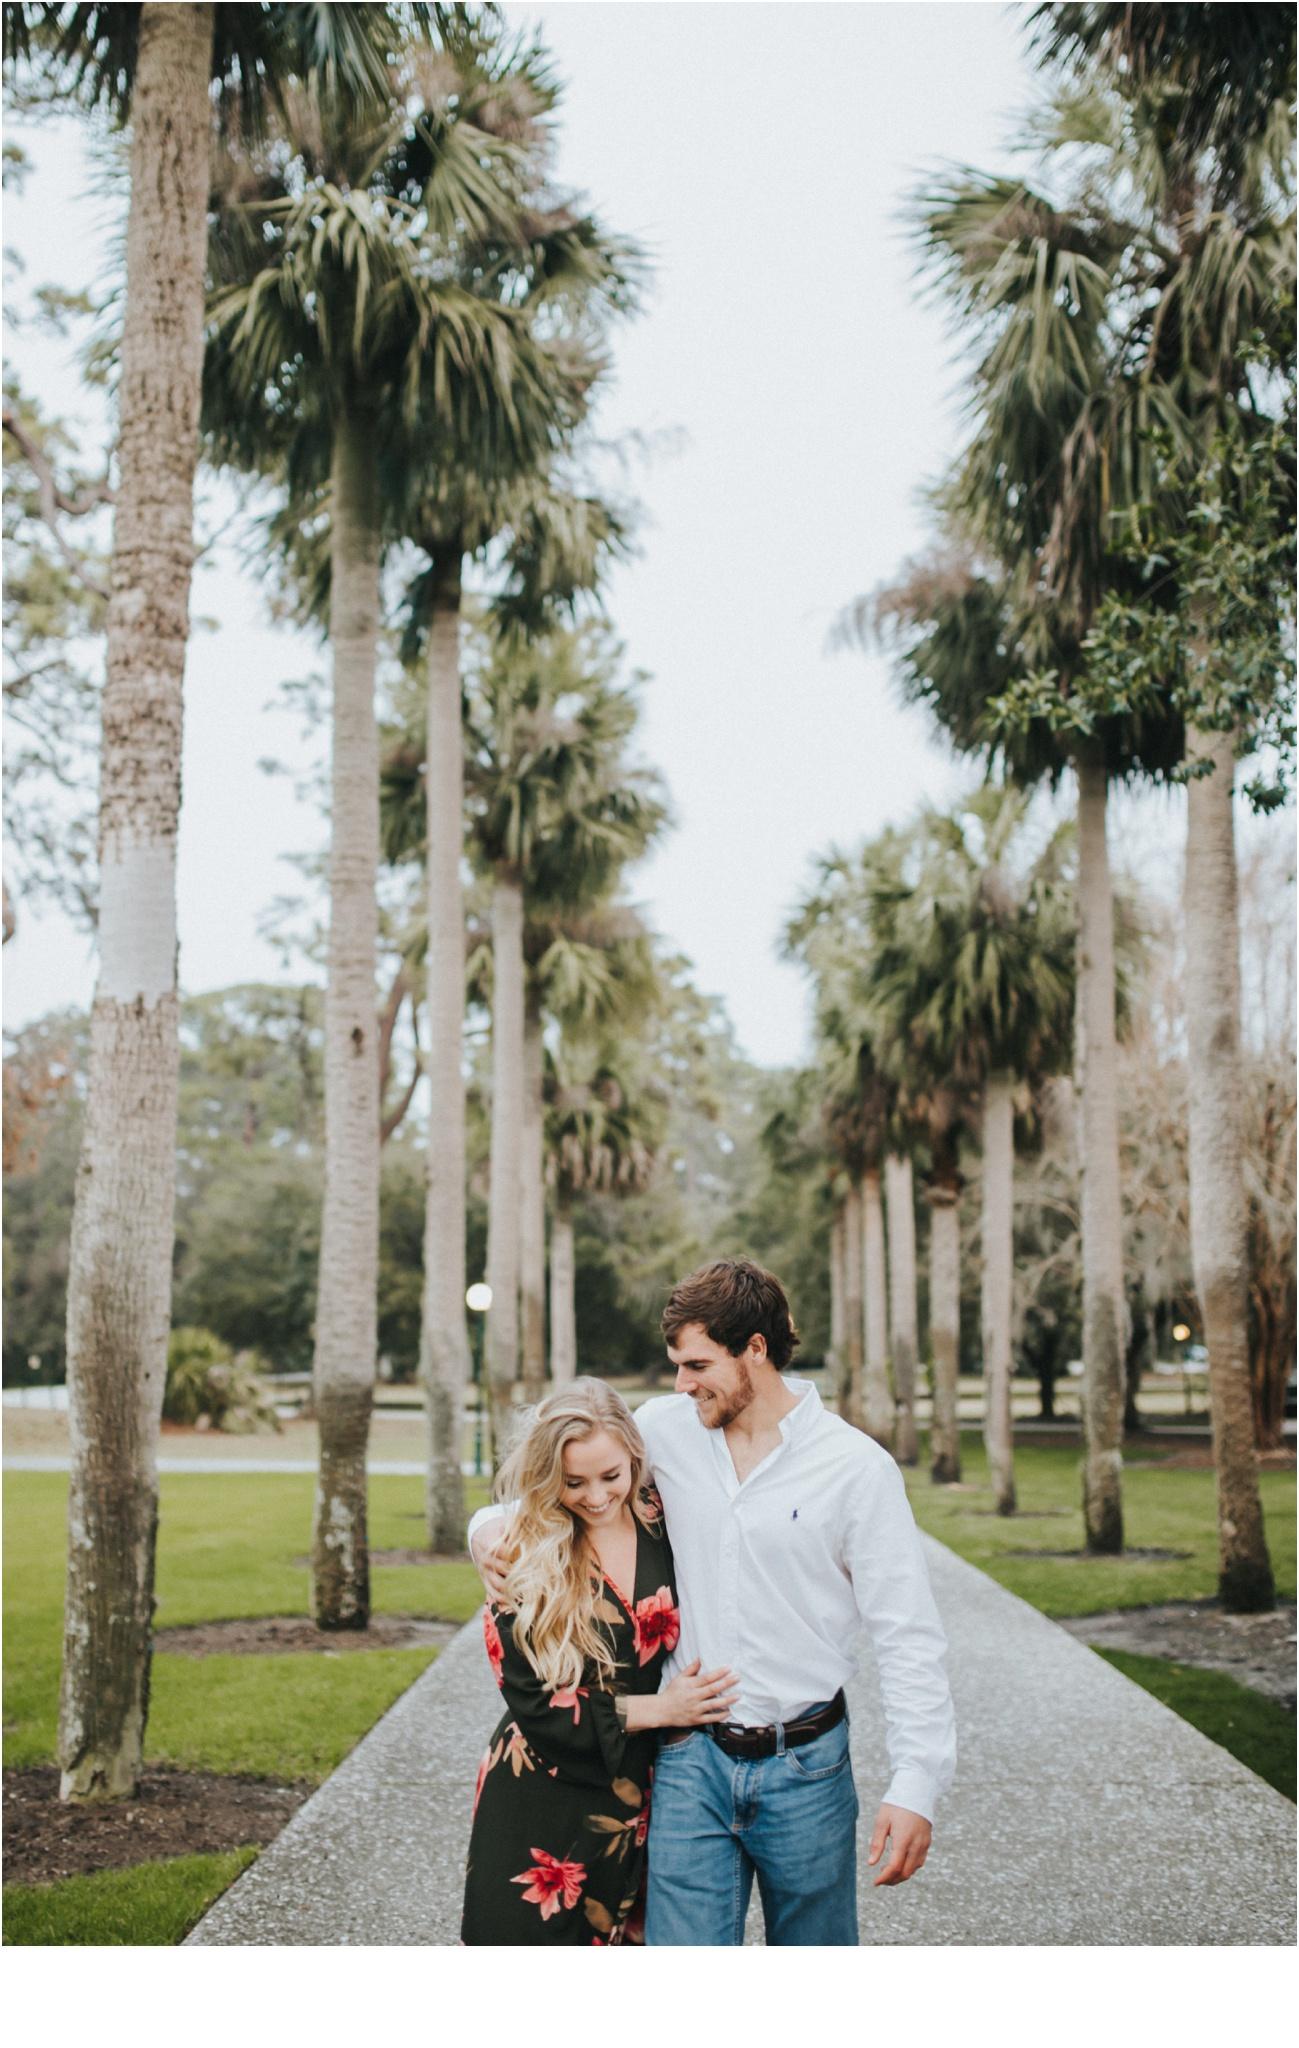 Rainey_Gregg_Photography_St._Simons_Island_Georgia_California_Wedding_Portrait_Photography_0711.jpg